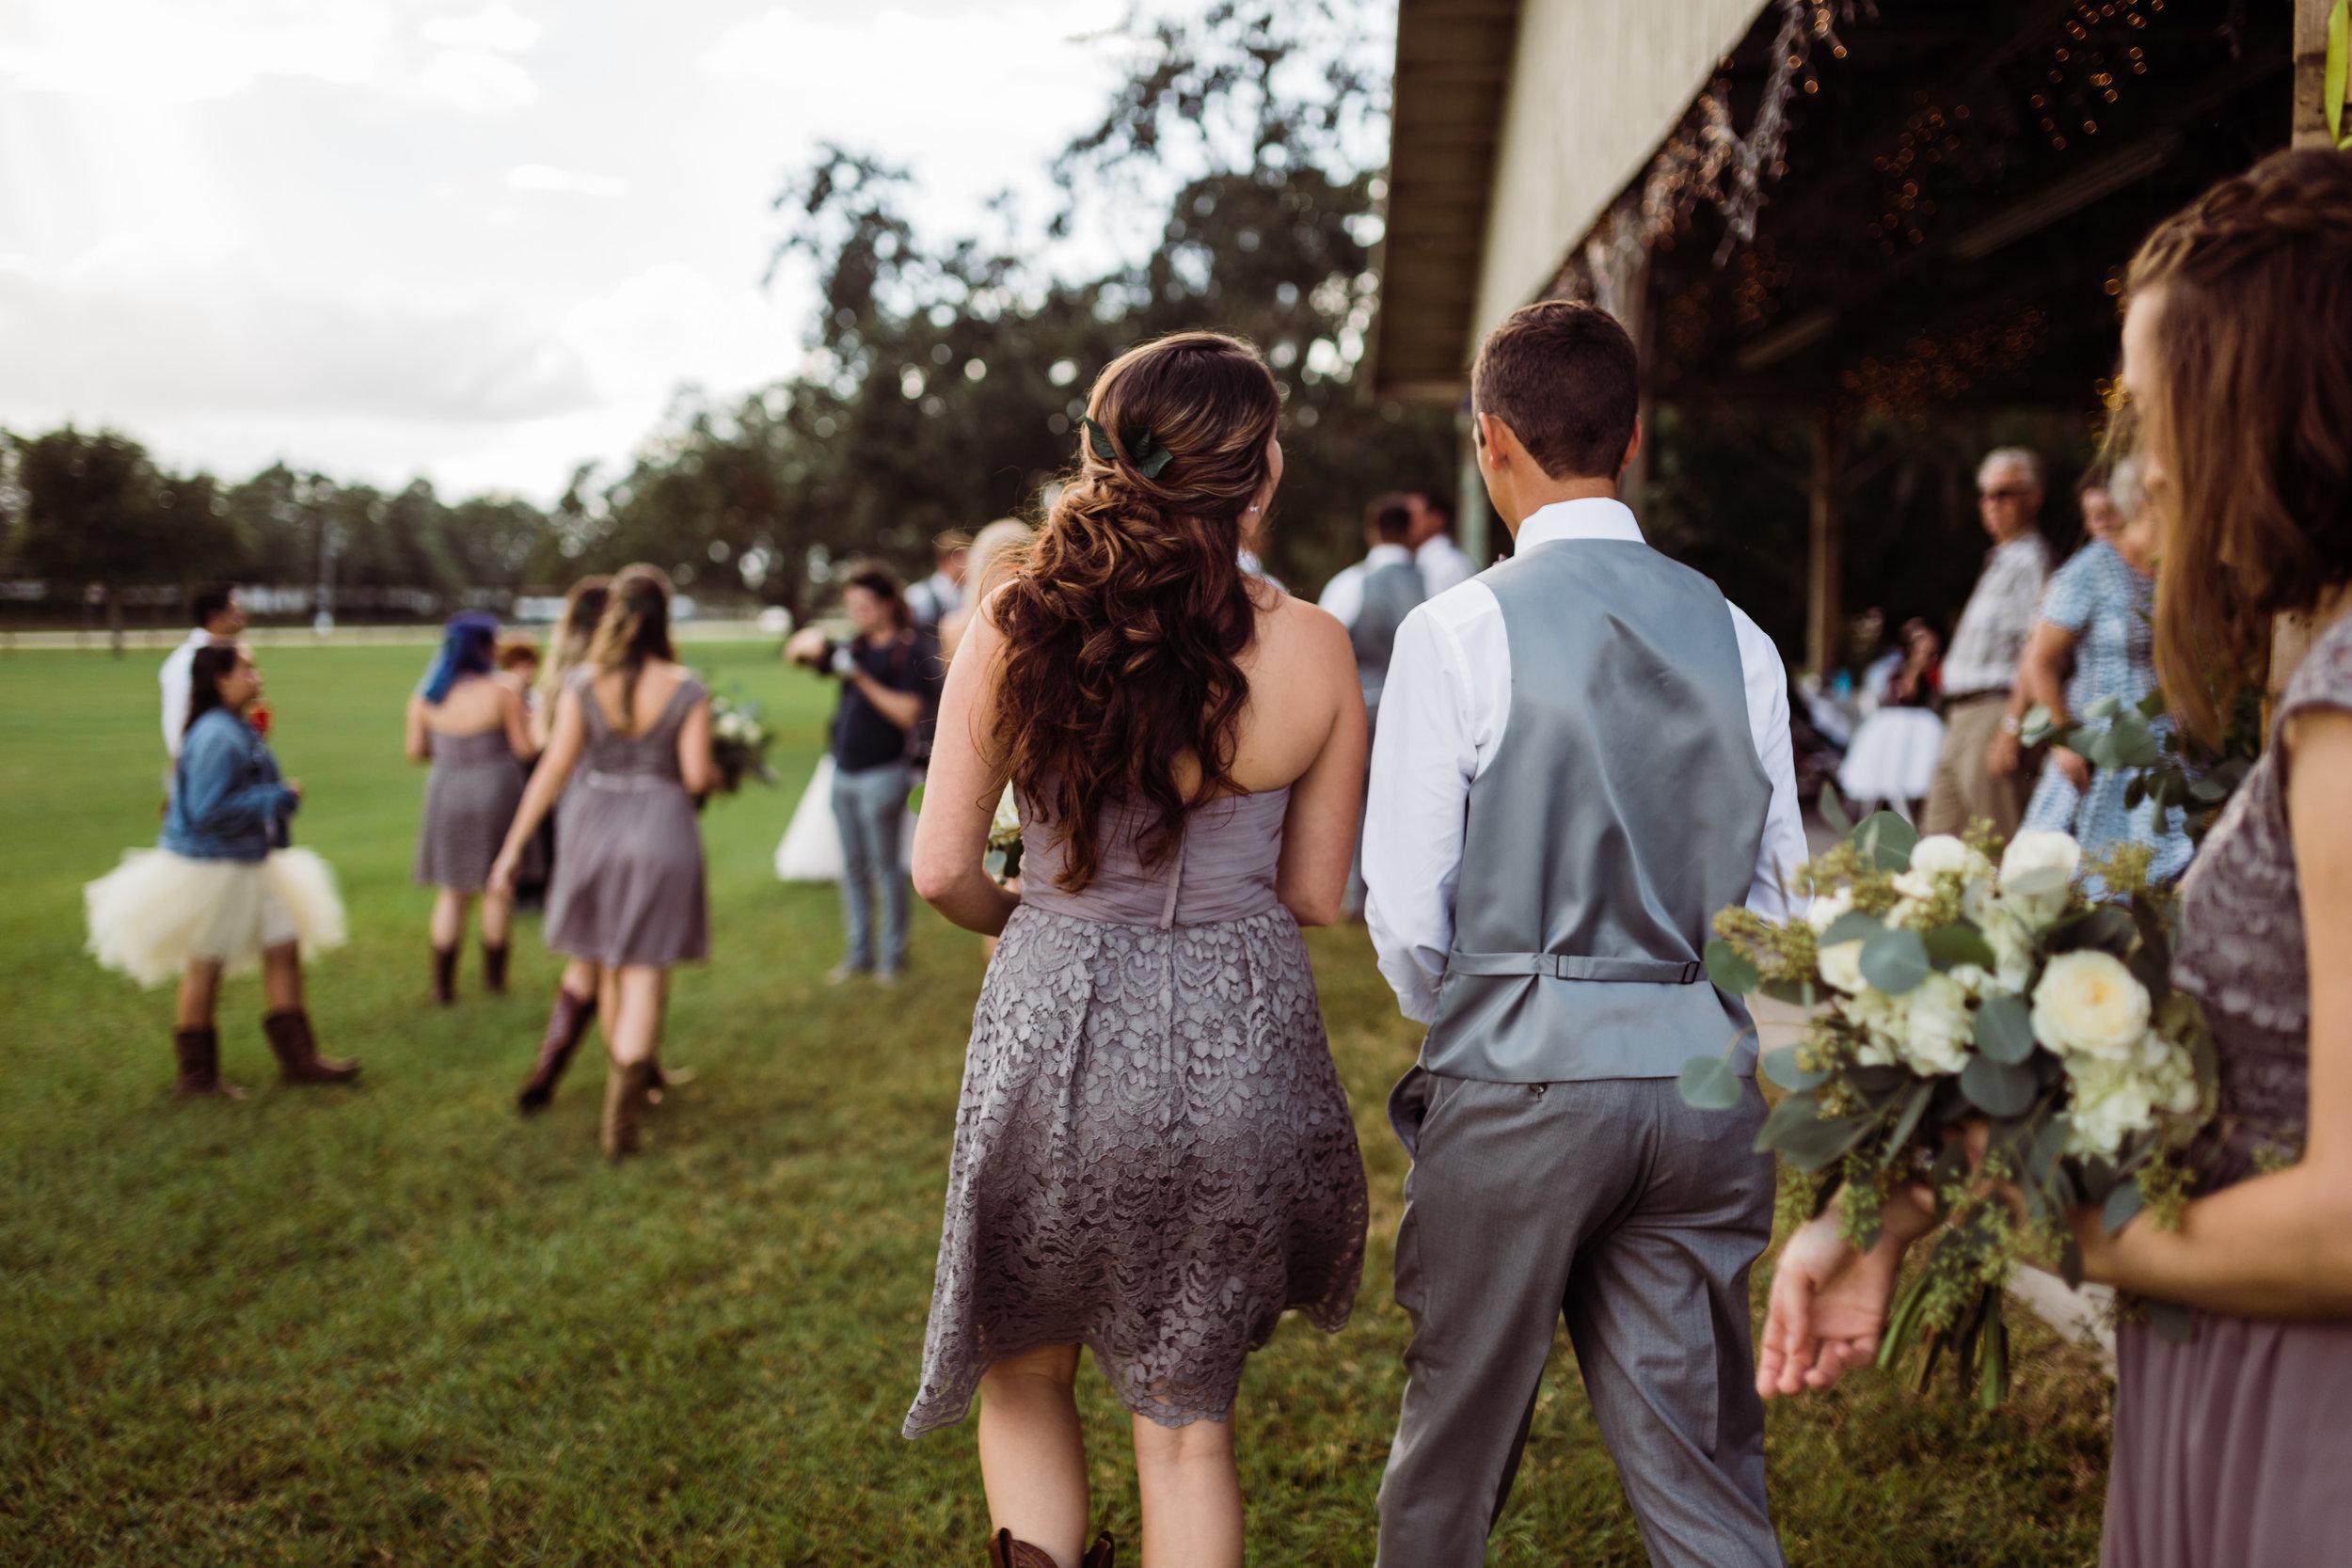 2017.10.14 Samantha and Matthew Crabtree Sarasota Wedding (250 of 708).jpg